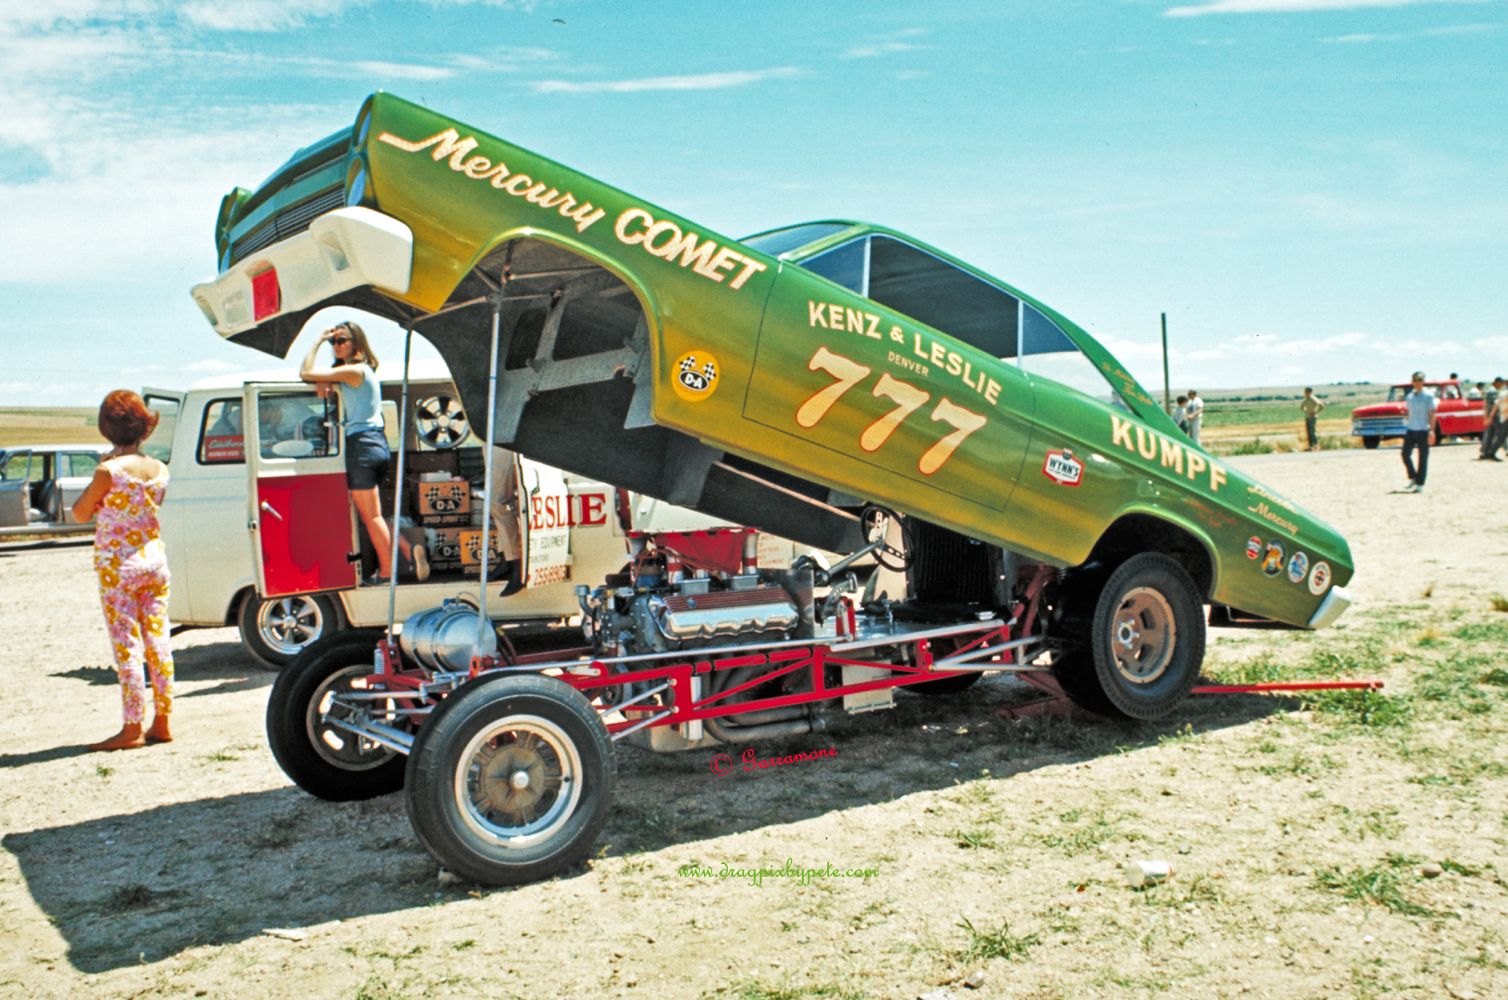 Kenz & Leslie Comet Funny Car @ Rocky Mountain Dragway July 1966